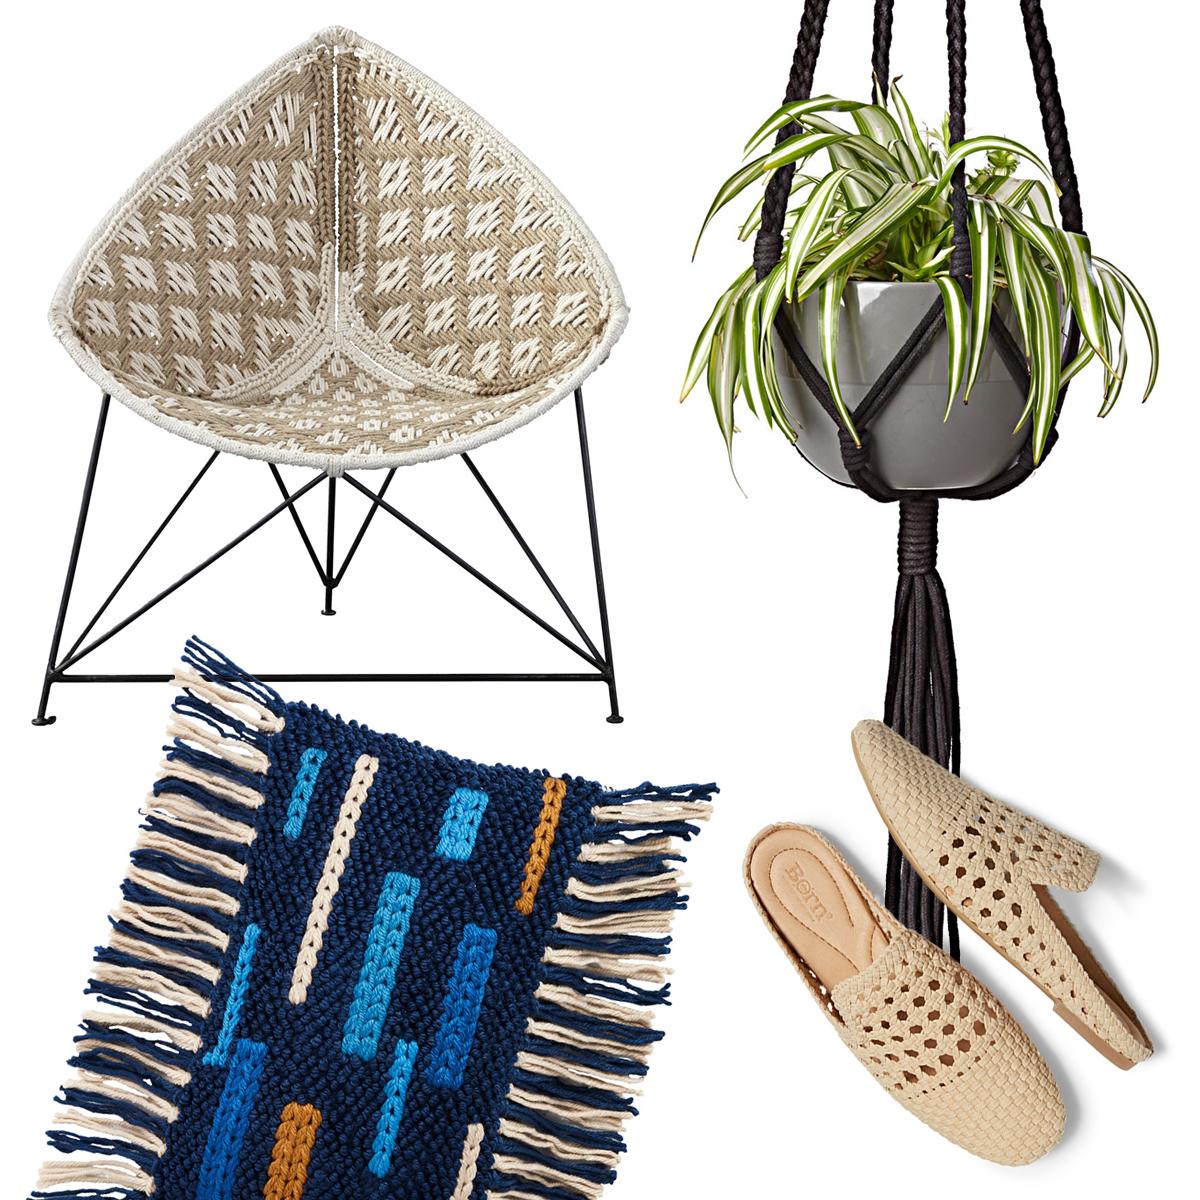 macrame-trends-chair-plant-pillow-shoes-0418-cmr6496798